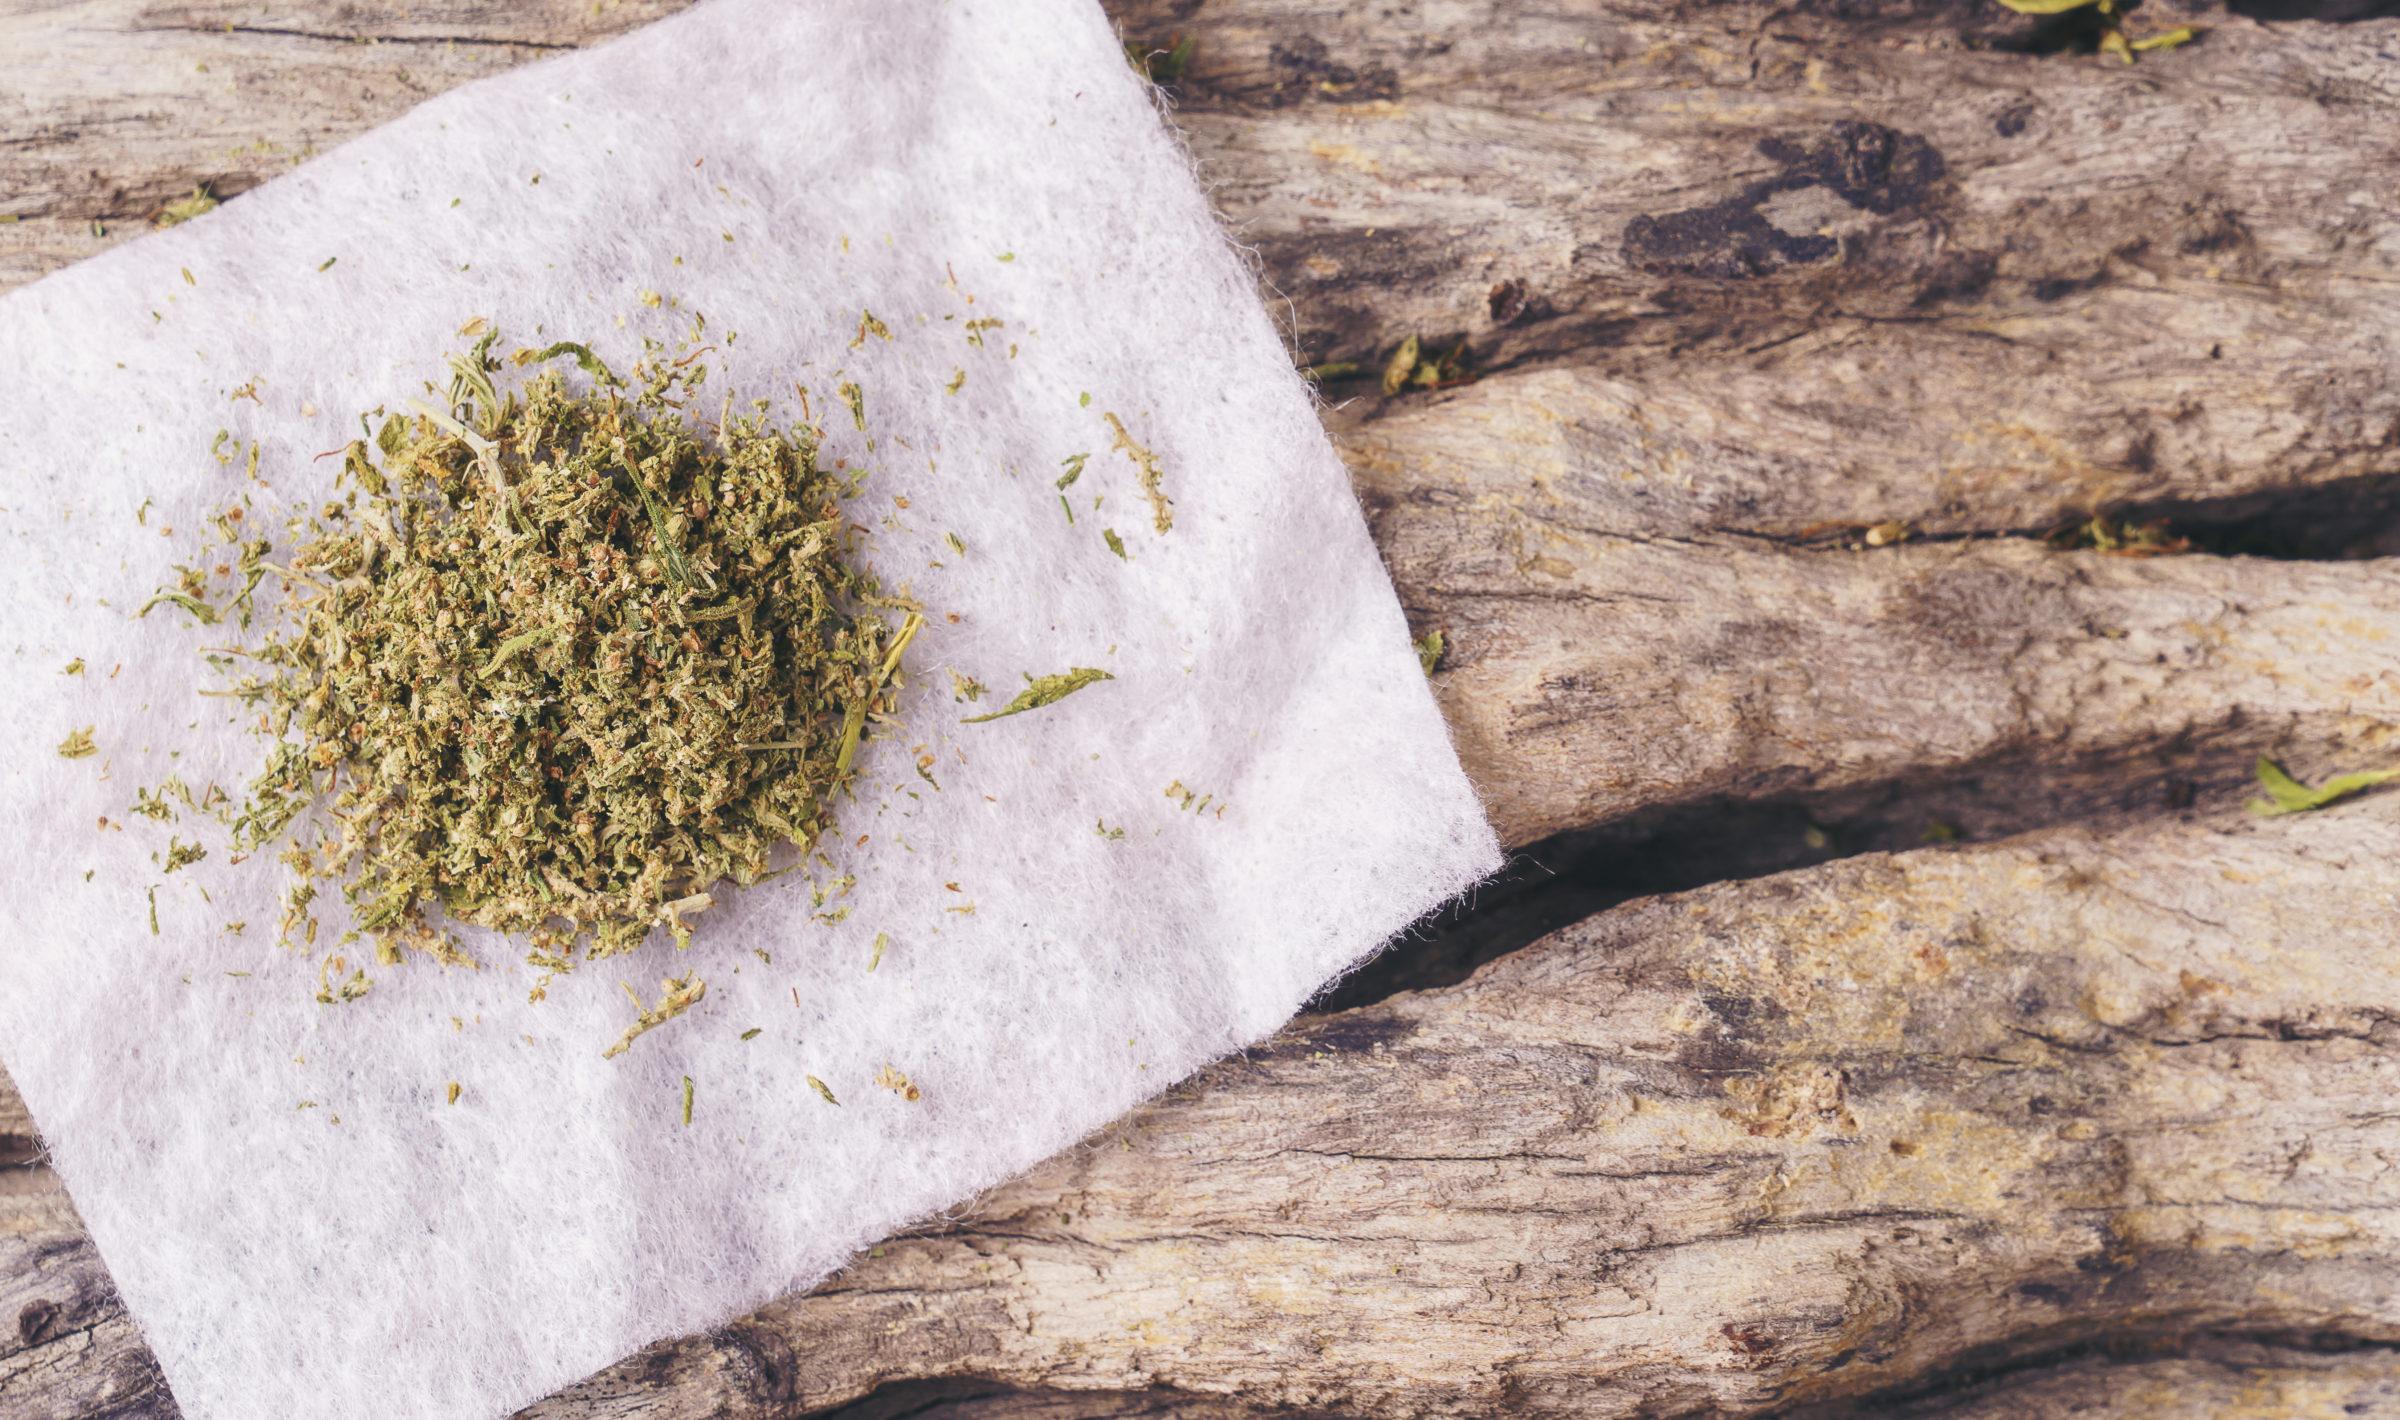 dried cannabis medical marijuana XRXNM4J